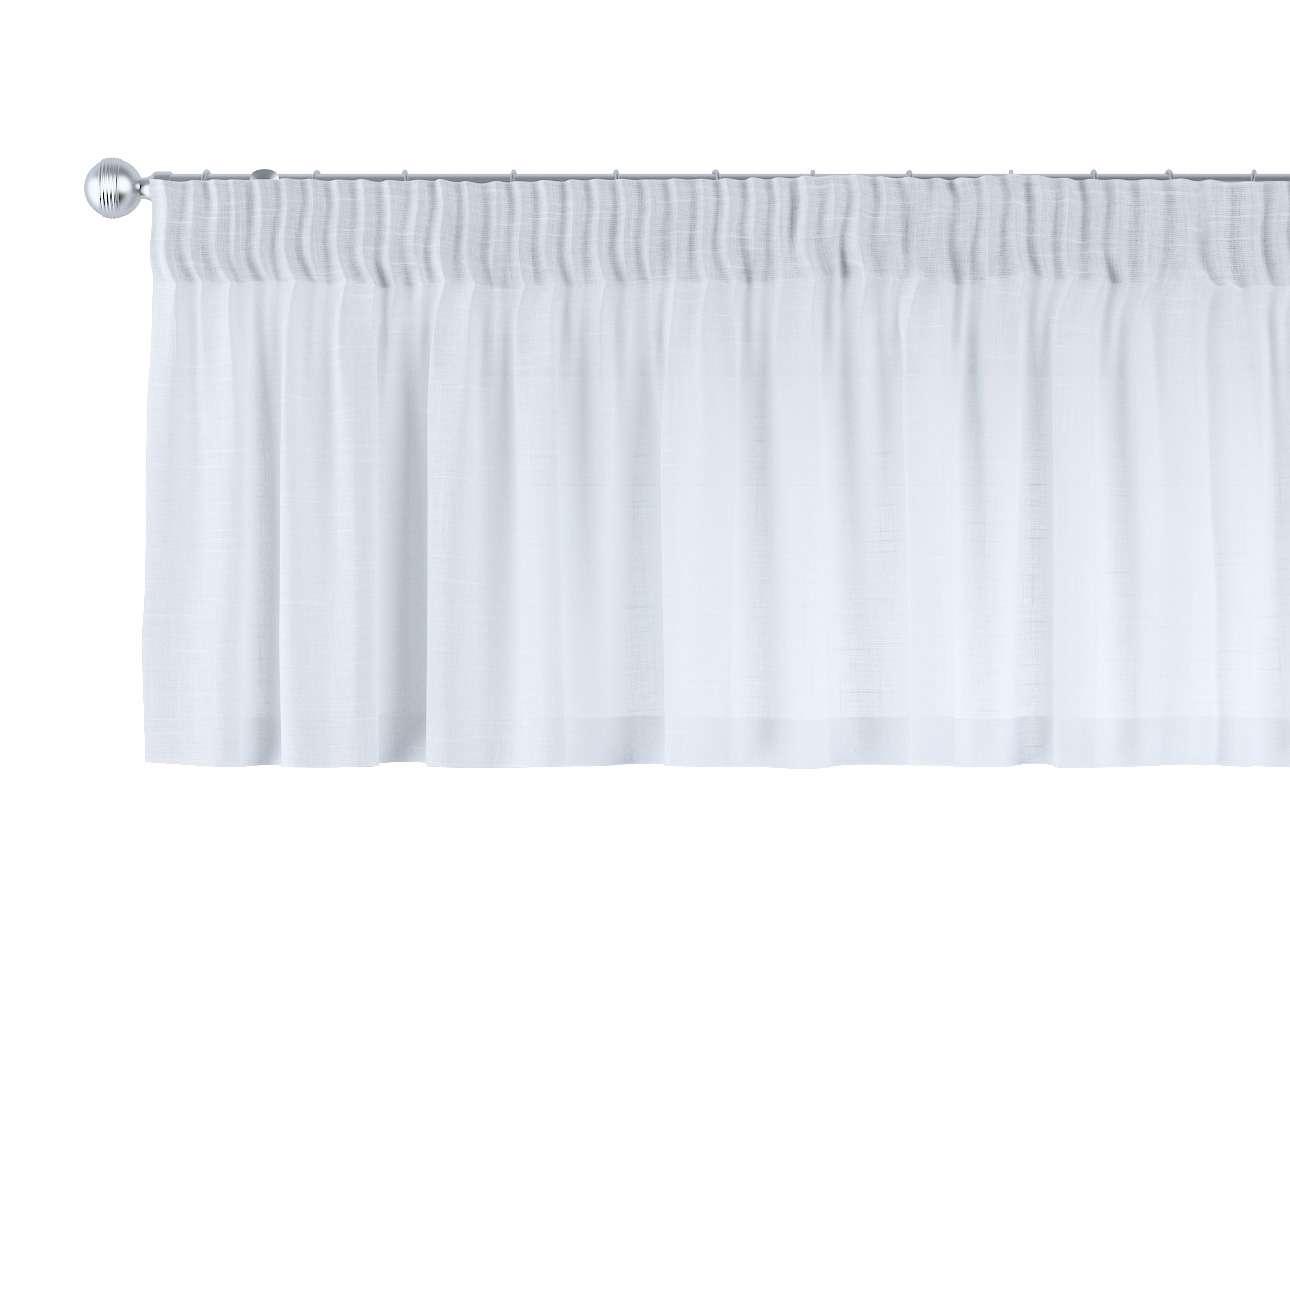 Gardinkappa med rynkband 130 x 40 cm i kollektionen Romantica, Tyg: 128-77